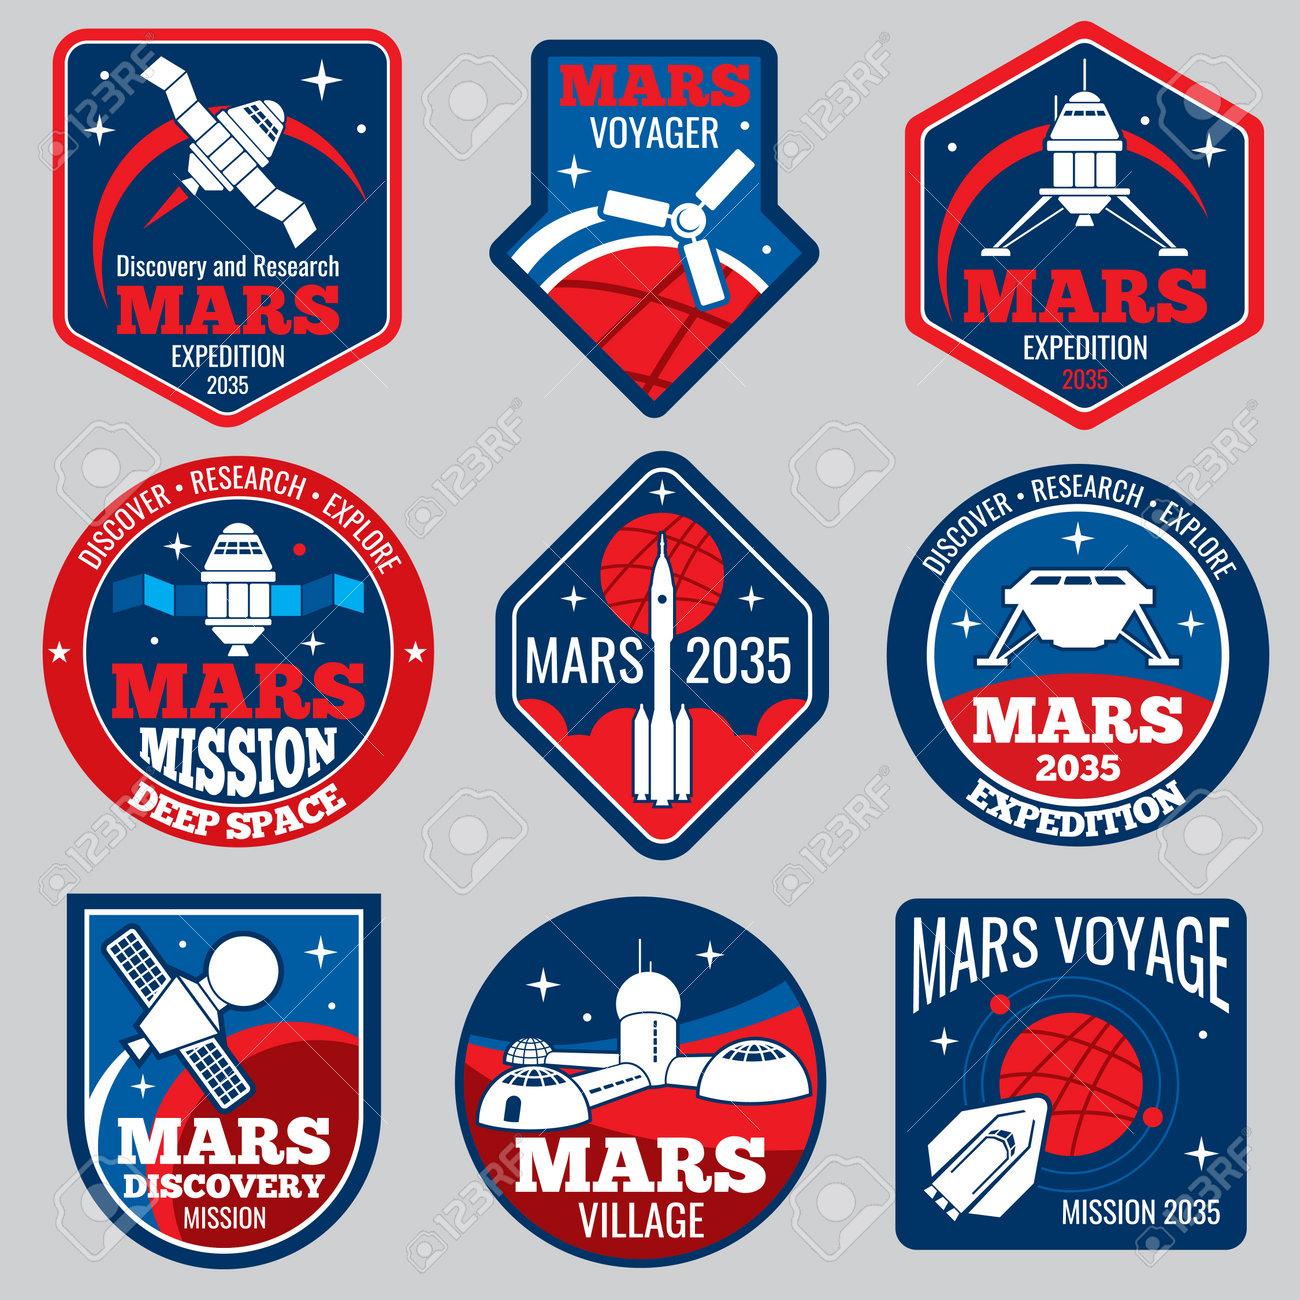 Mars colonization vector retro space logos and labels set. Exploration mars planet logo, emblem travel to mars illustration - 165866772